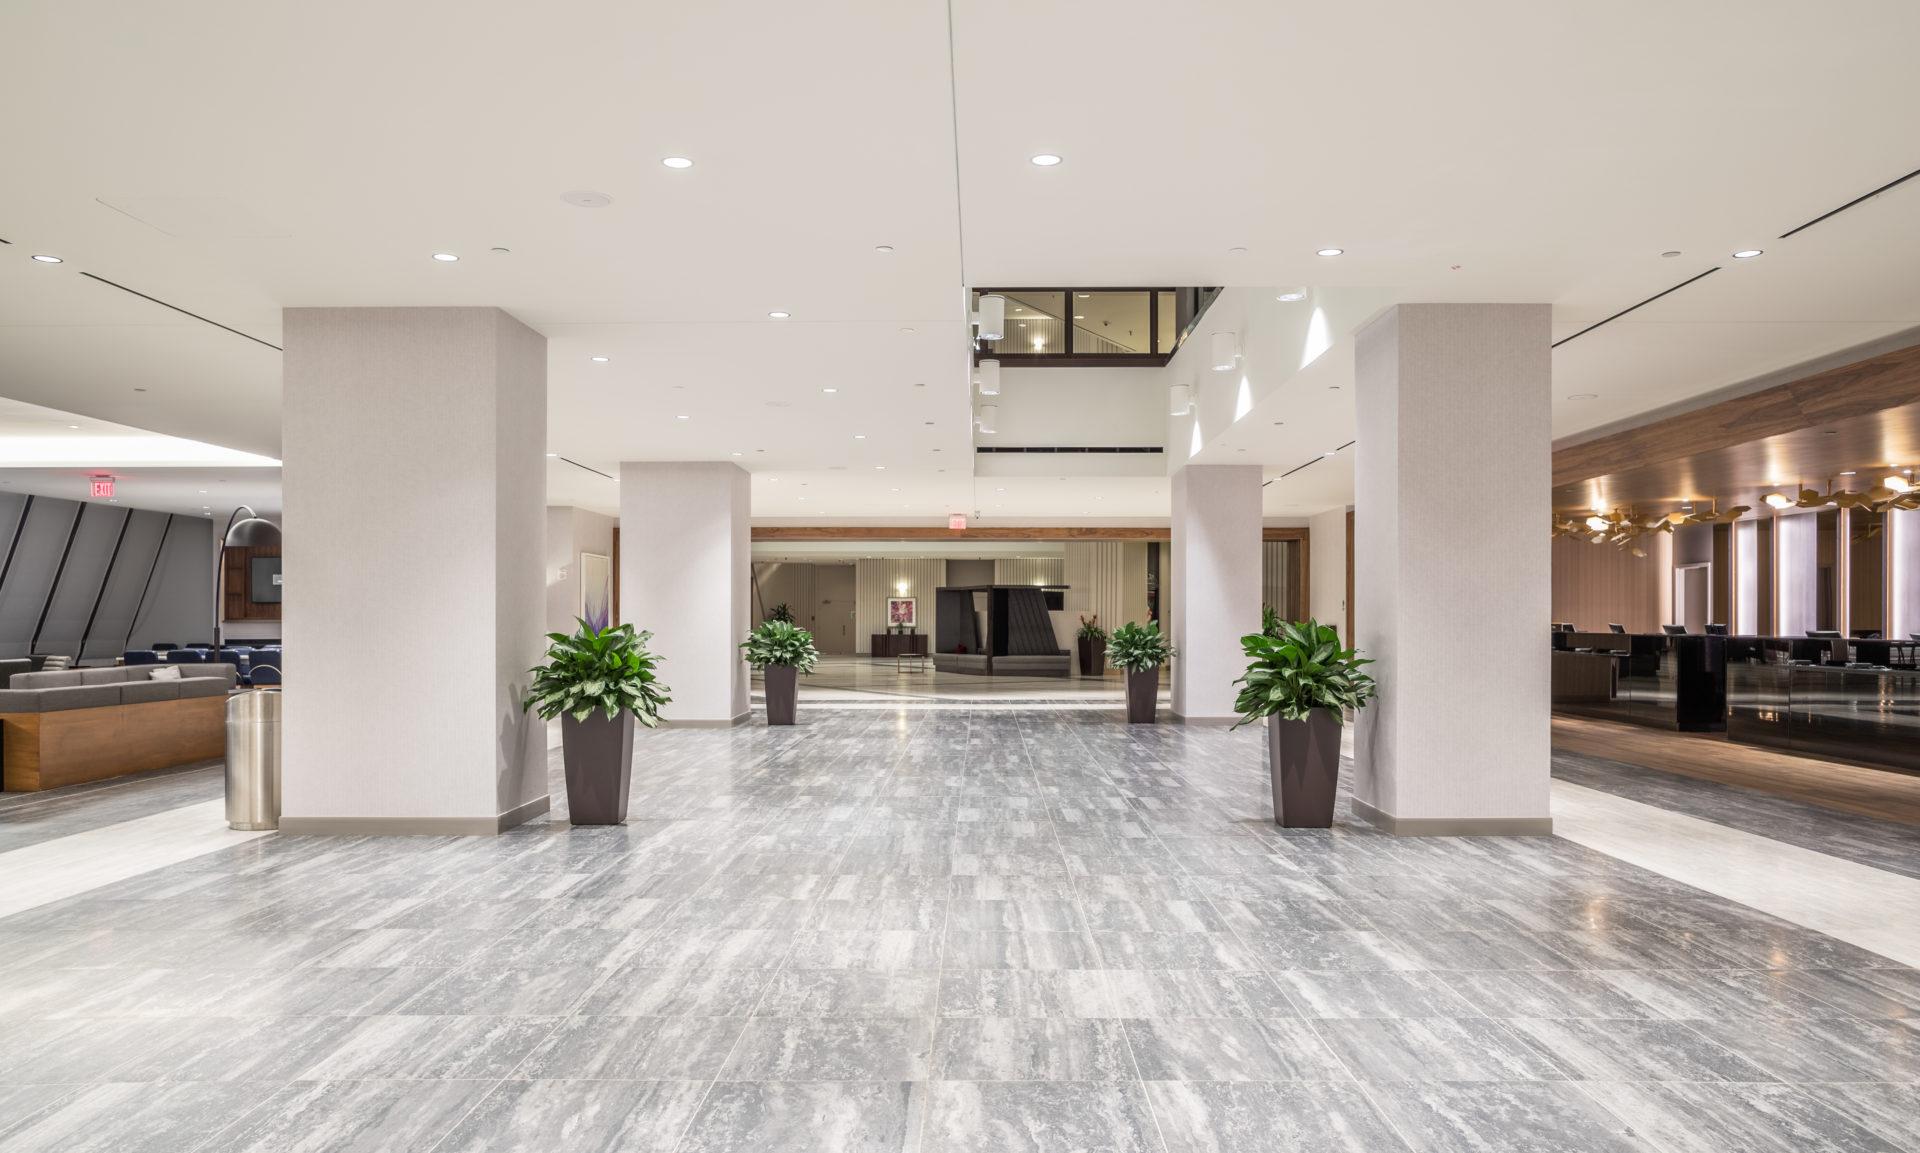 Multi-tonal gray tile installed in reception area